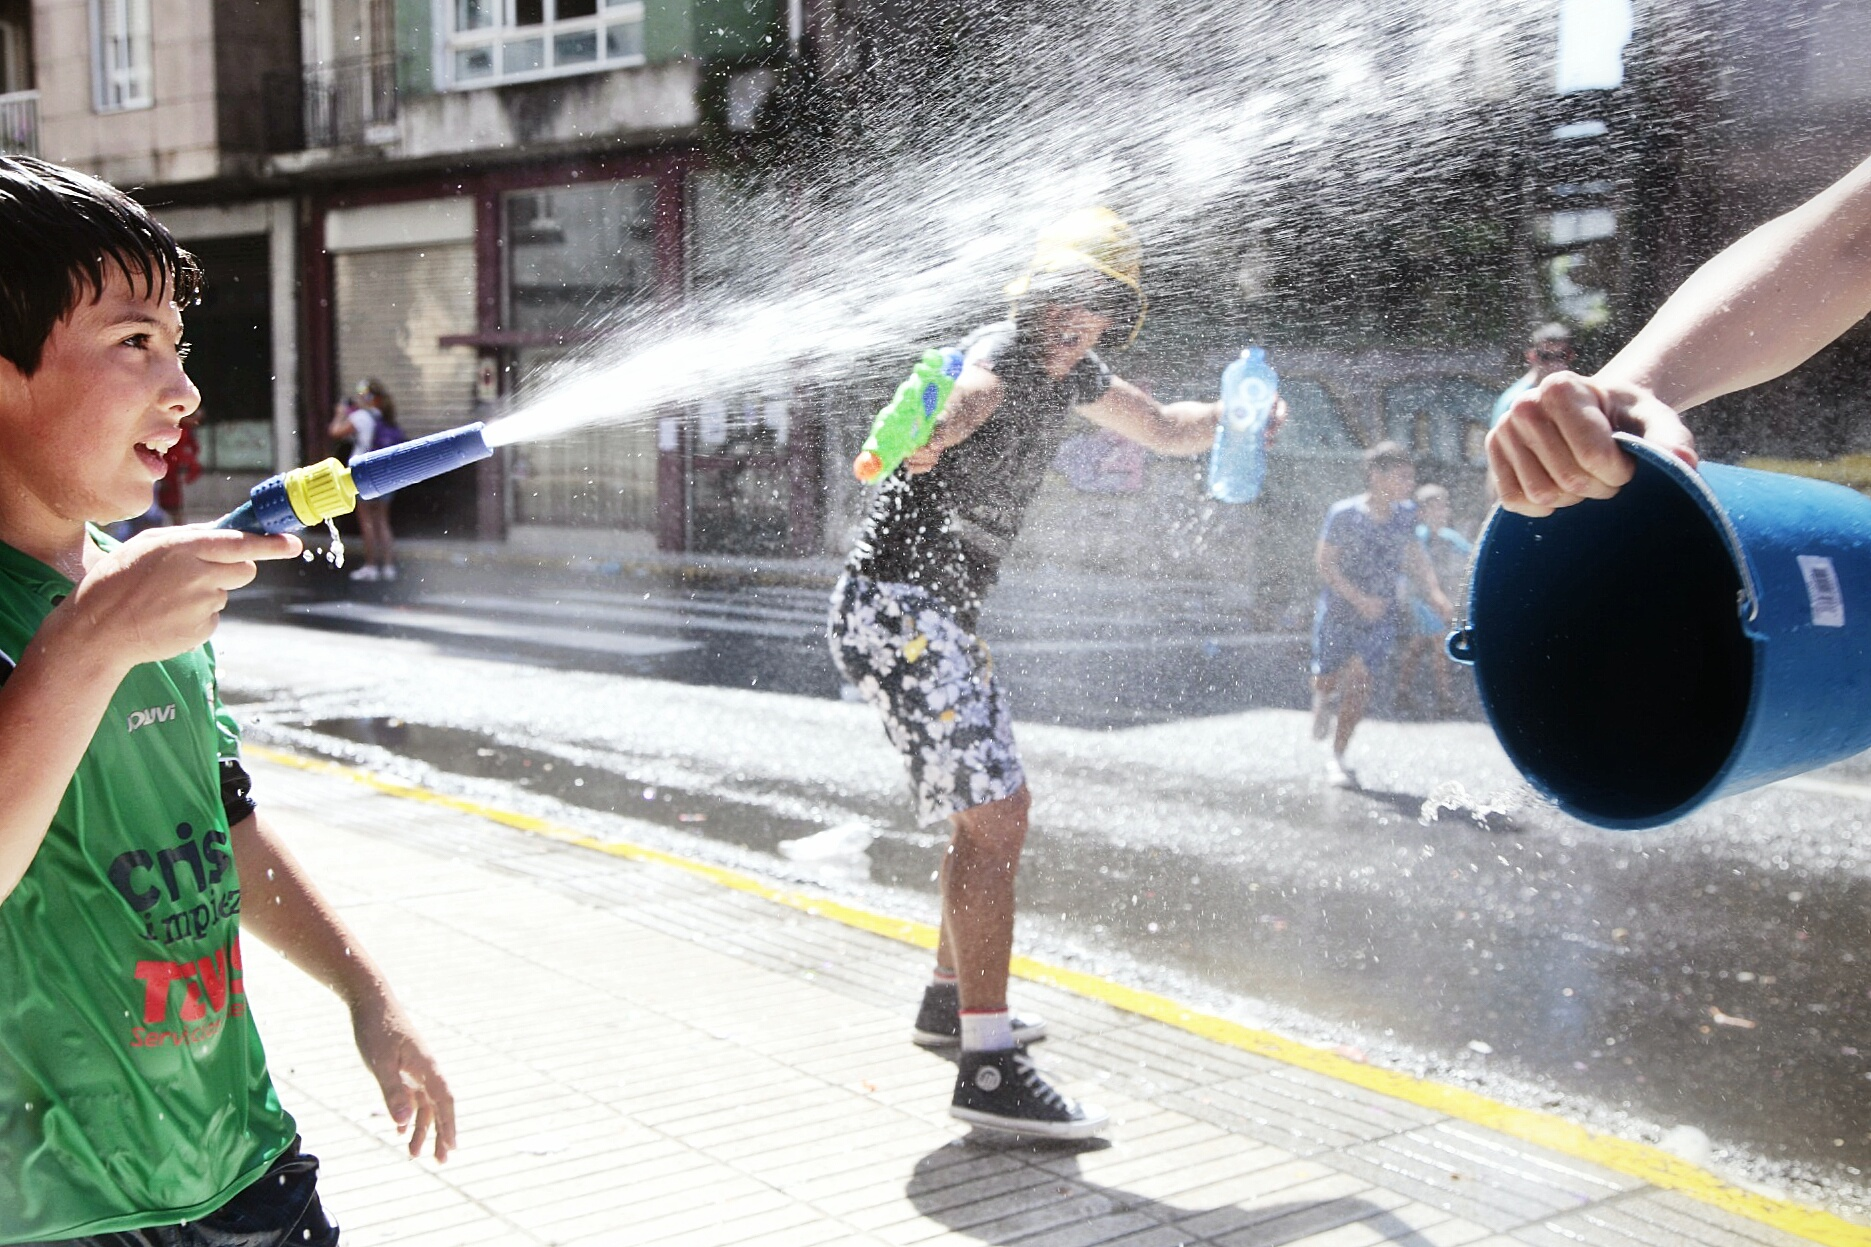 Festa da Auga - Vilagarcía 2014 by Beyuve (4).jpg